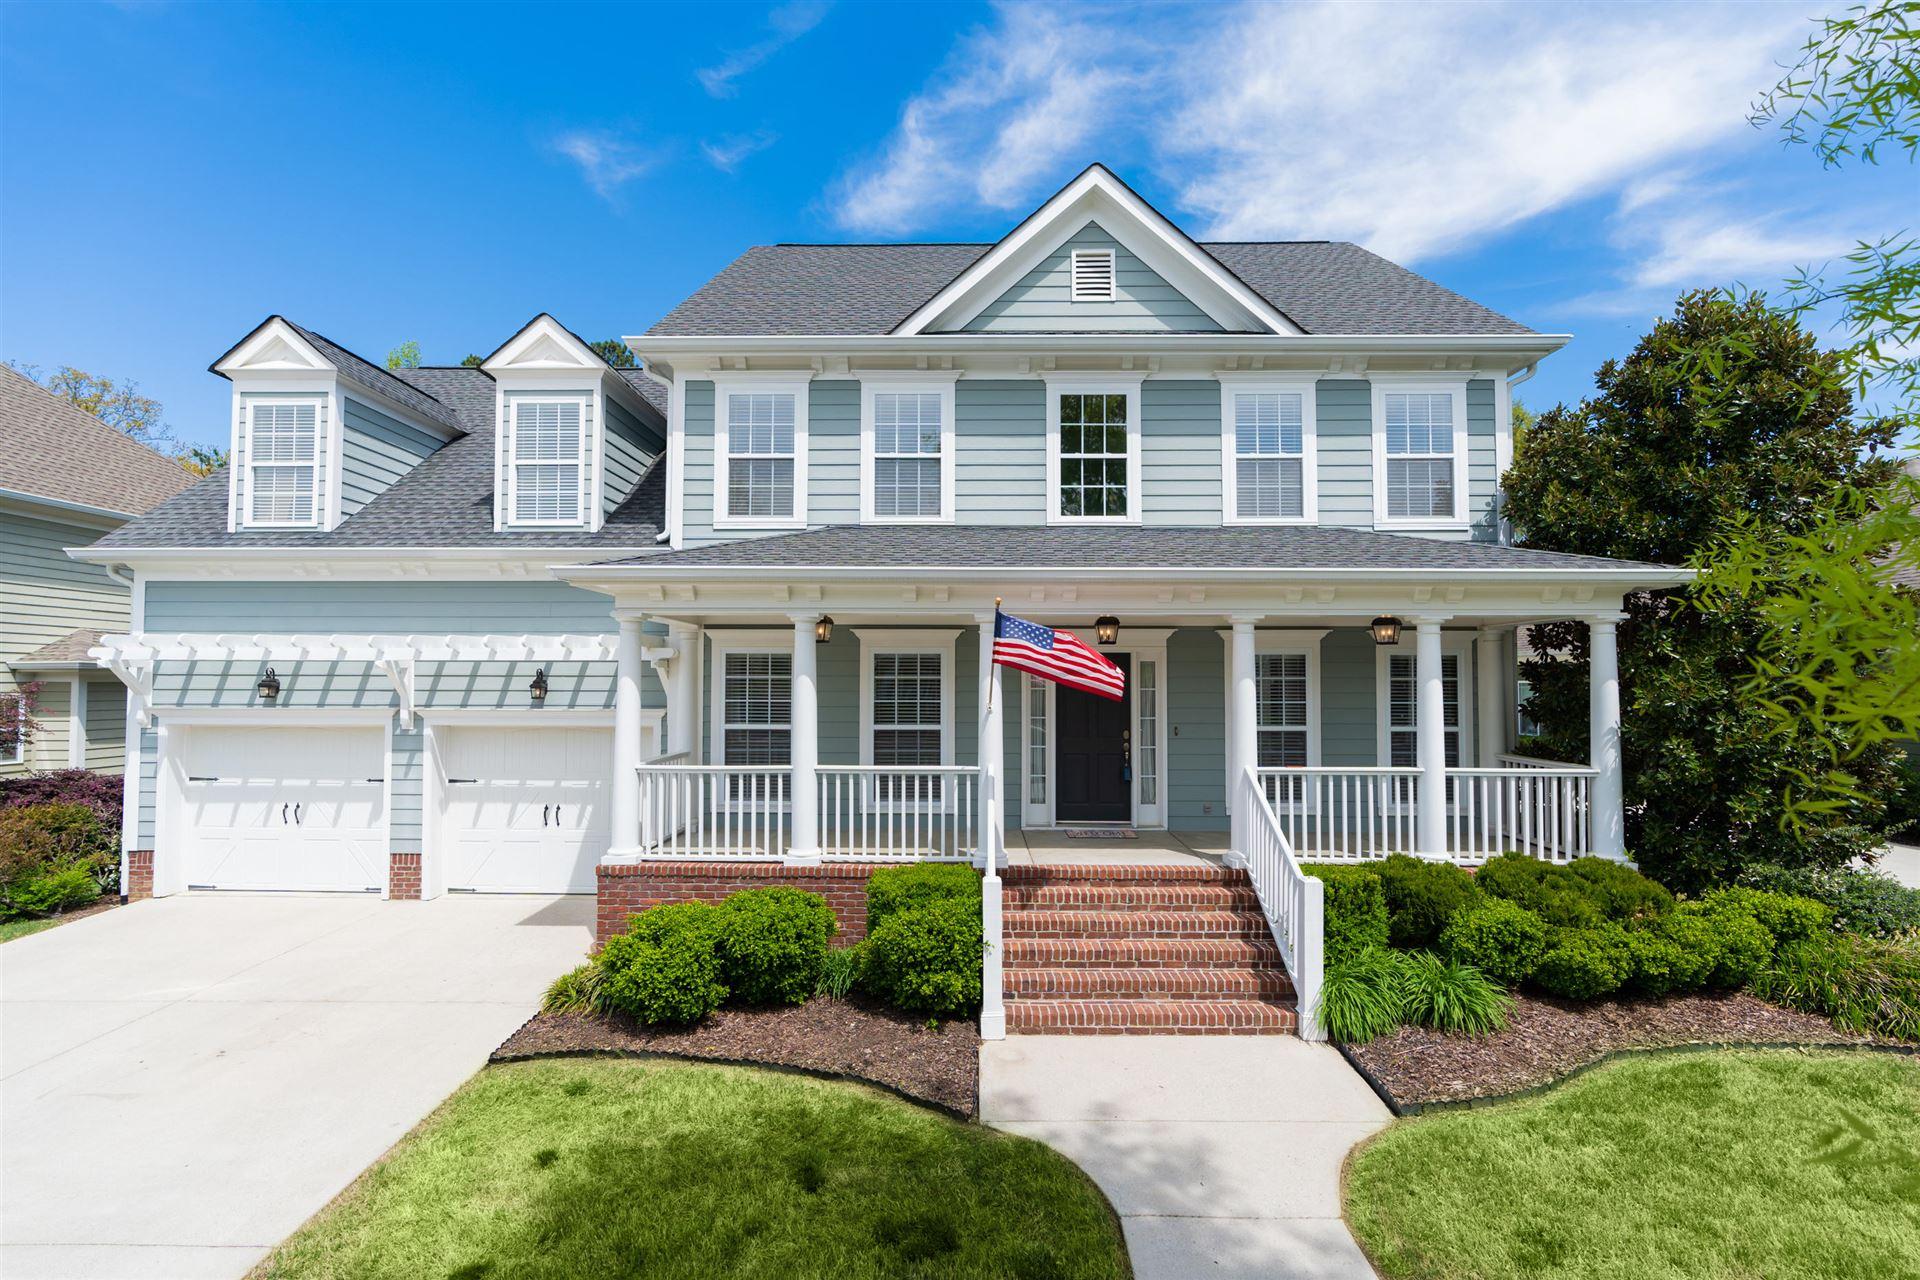 8655 Homecoming Dr, Chattanooga, TN 37421 - #: 1317160